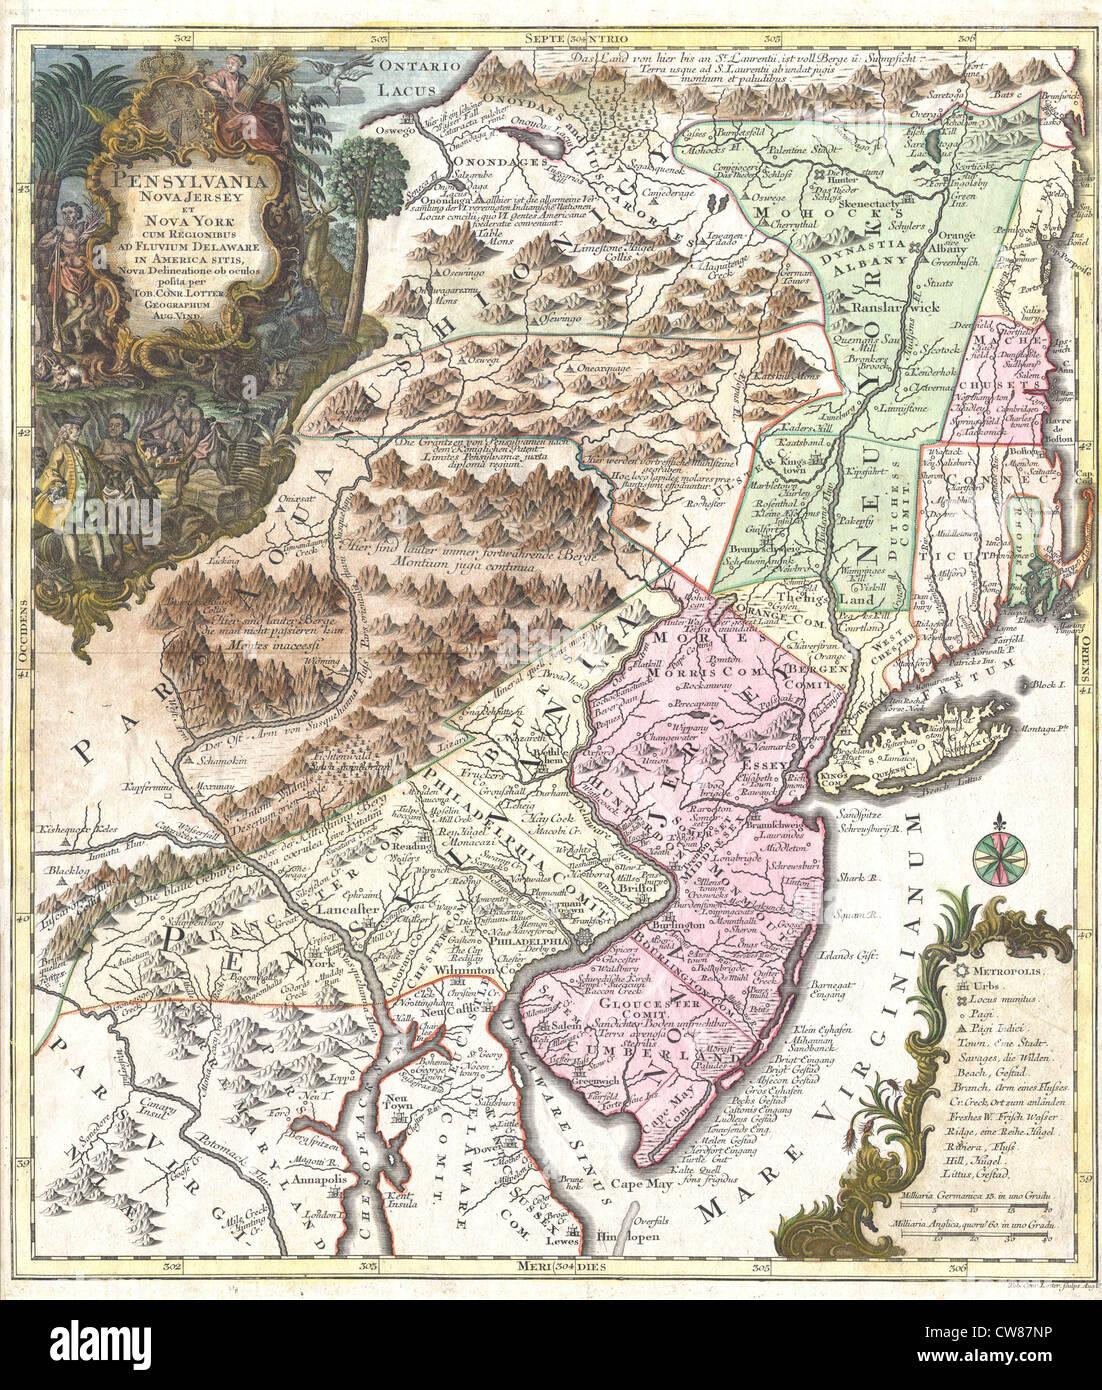 1756 Lotter Map Of Pennsylvania New Jersey New York Stock Photo